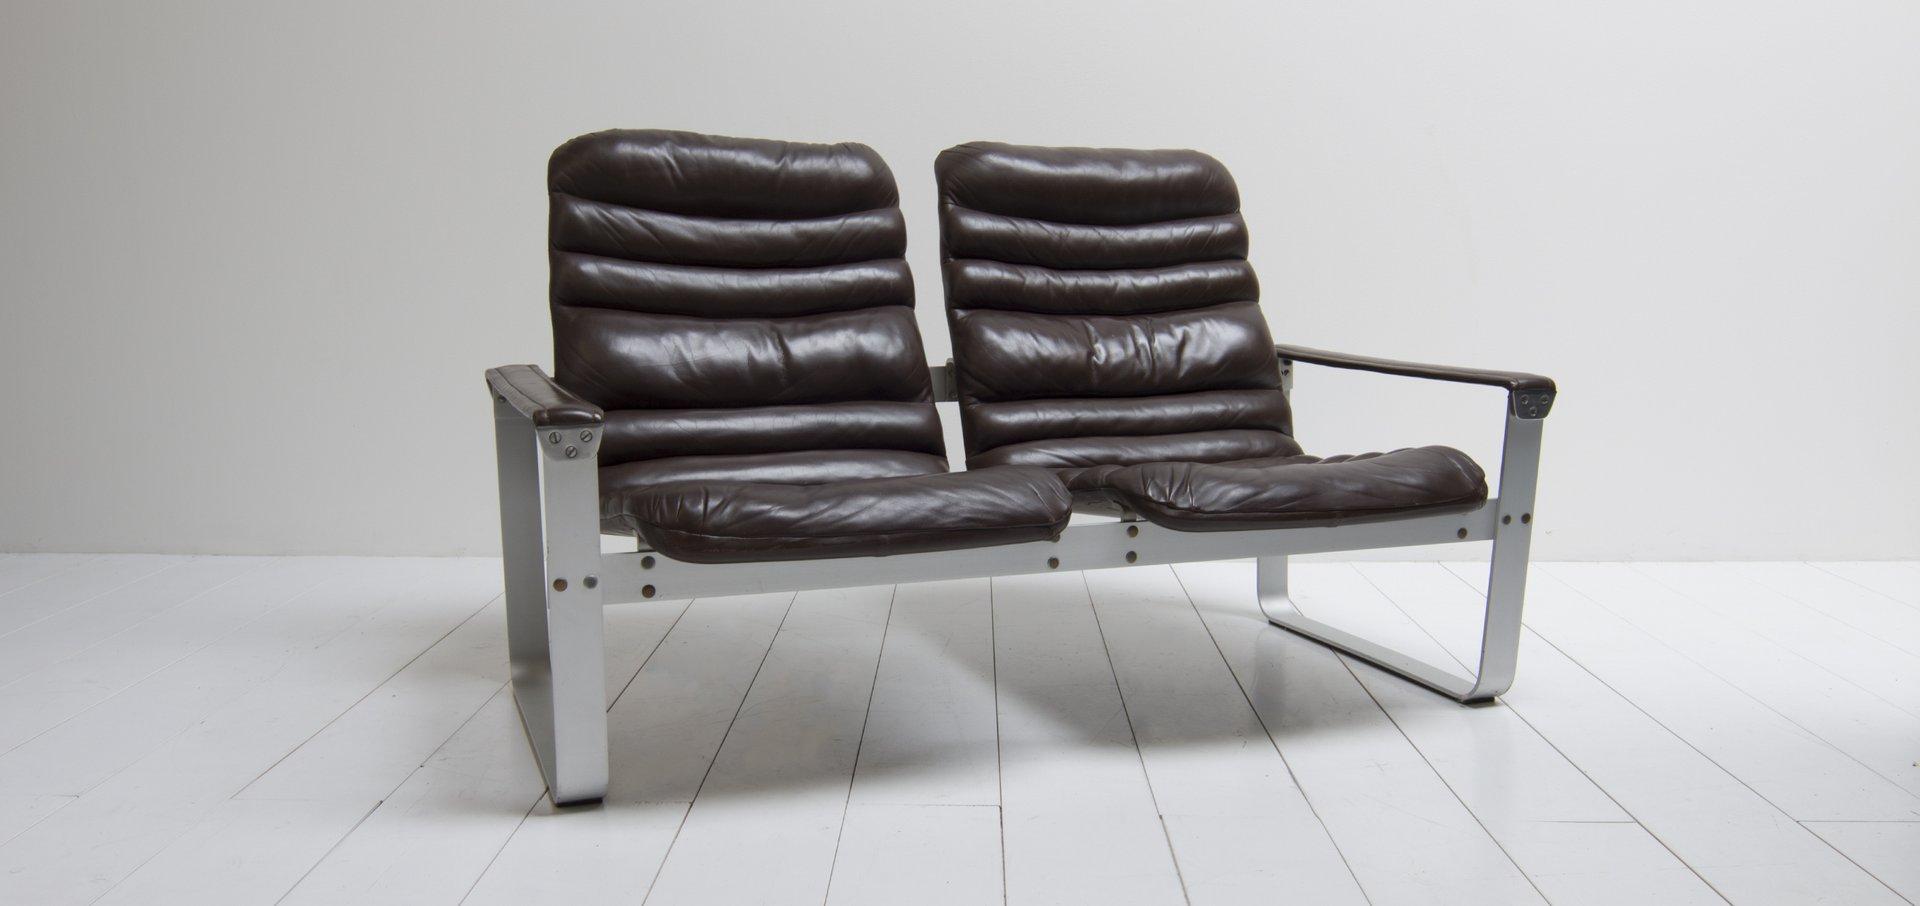 vintage modell pulkka sofa von ilmari lappalainen f r asko bei pamono kaufen. Black Bedroom Furniture Sets. Home Design Ideas